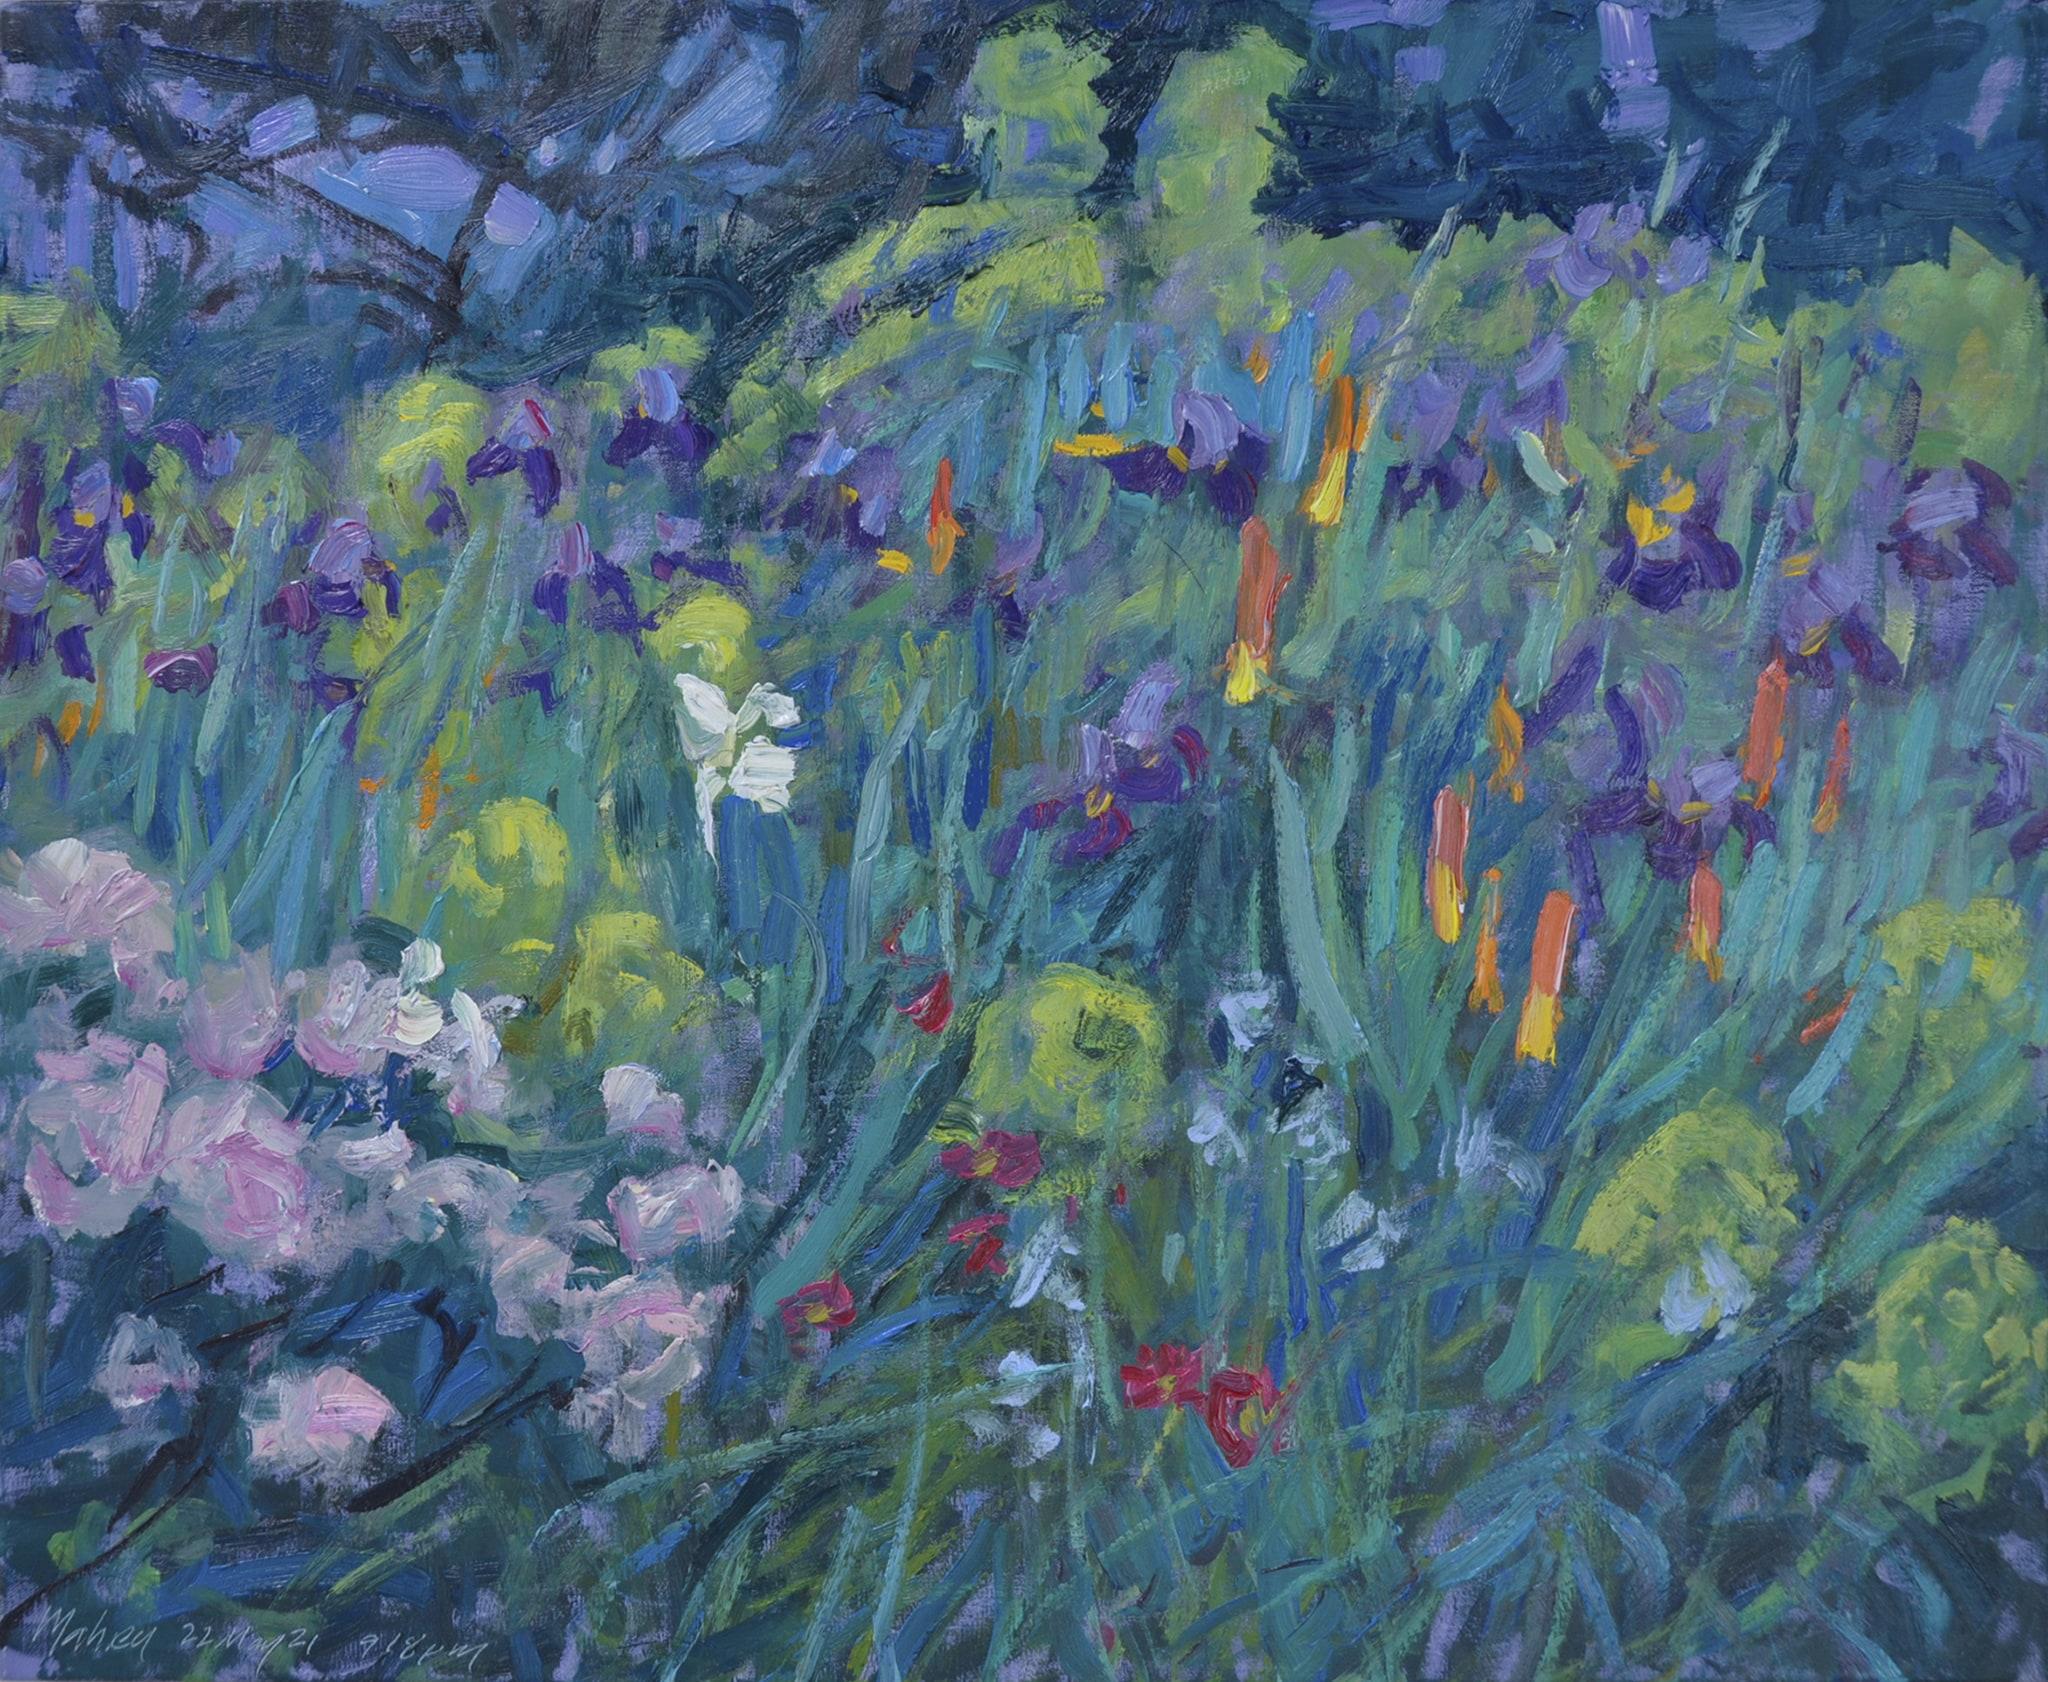 Twilight Garden—Iris and Torch LIlies